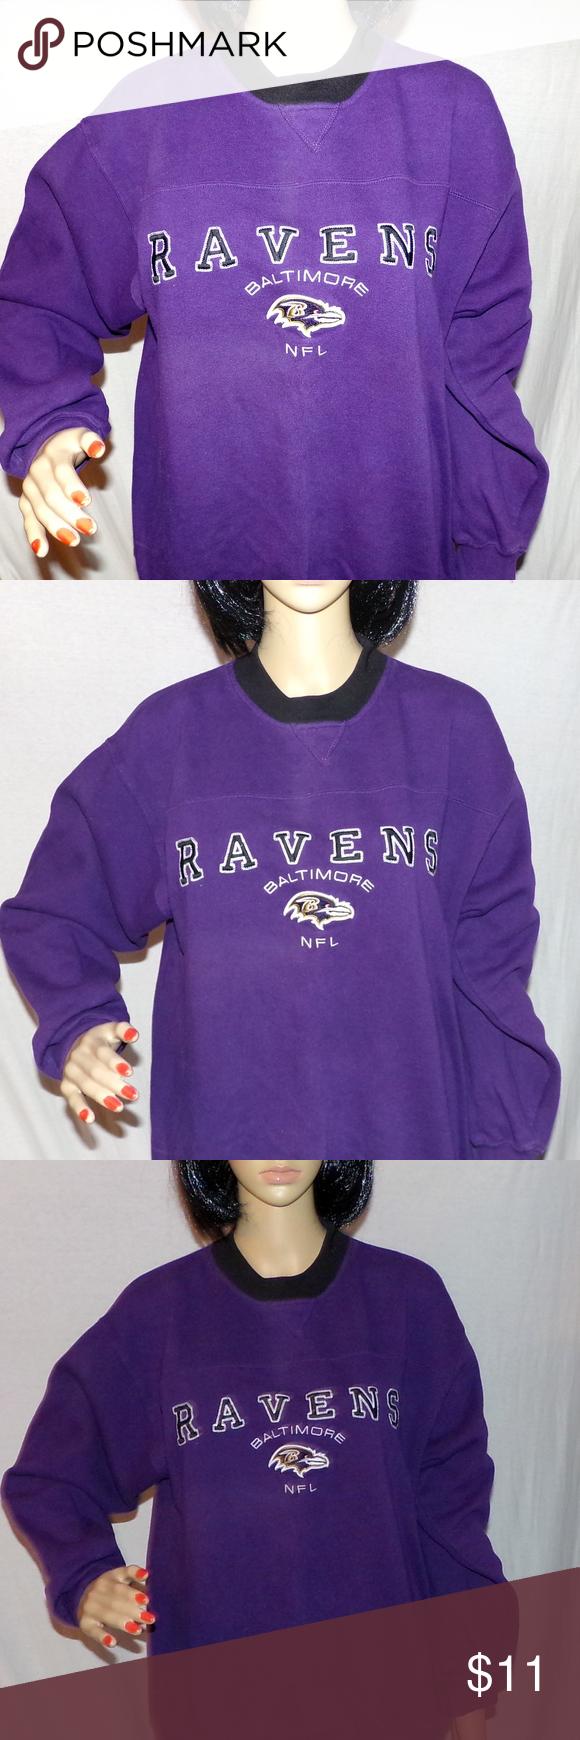 Baltimore Ravens Sweatshirt Embroidered NFL M